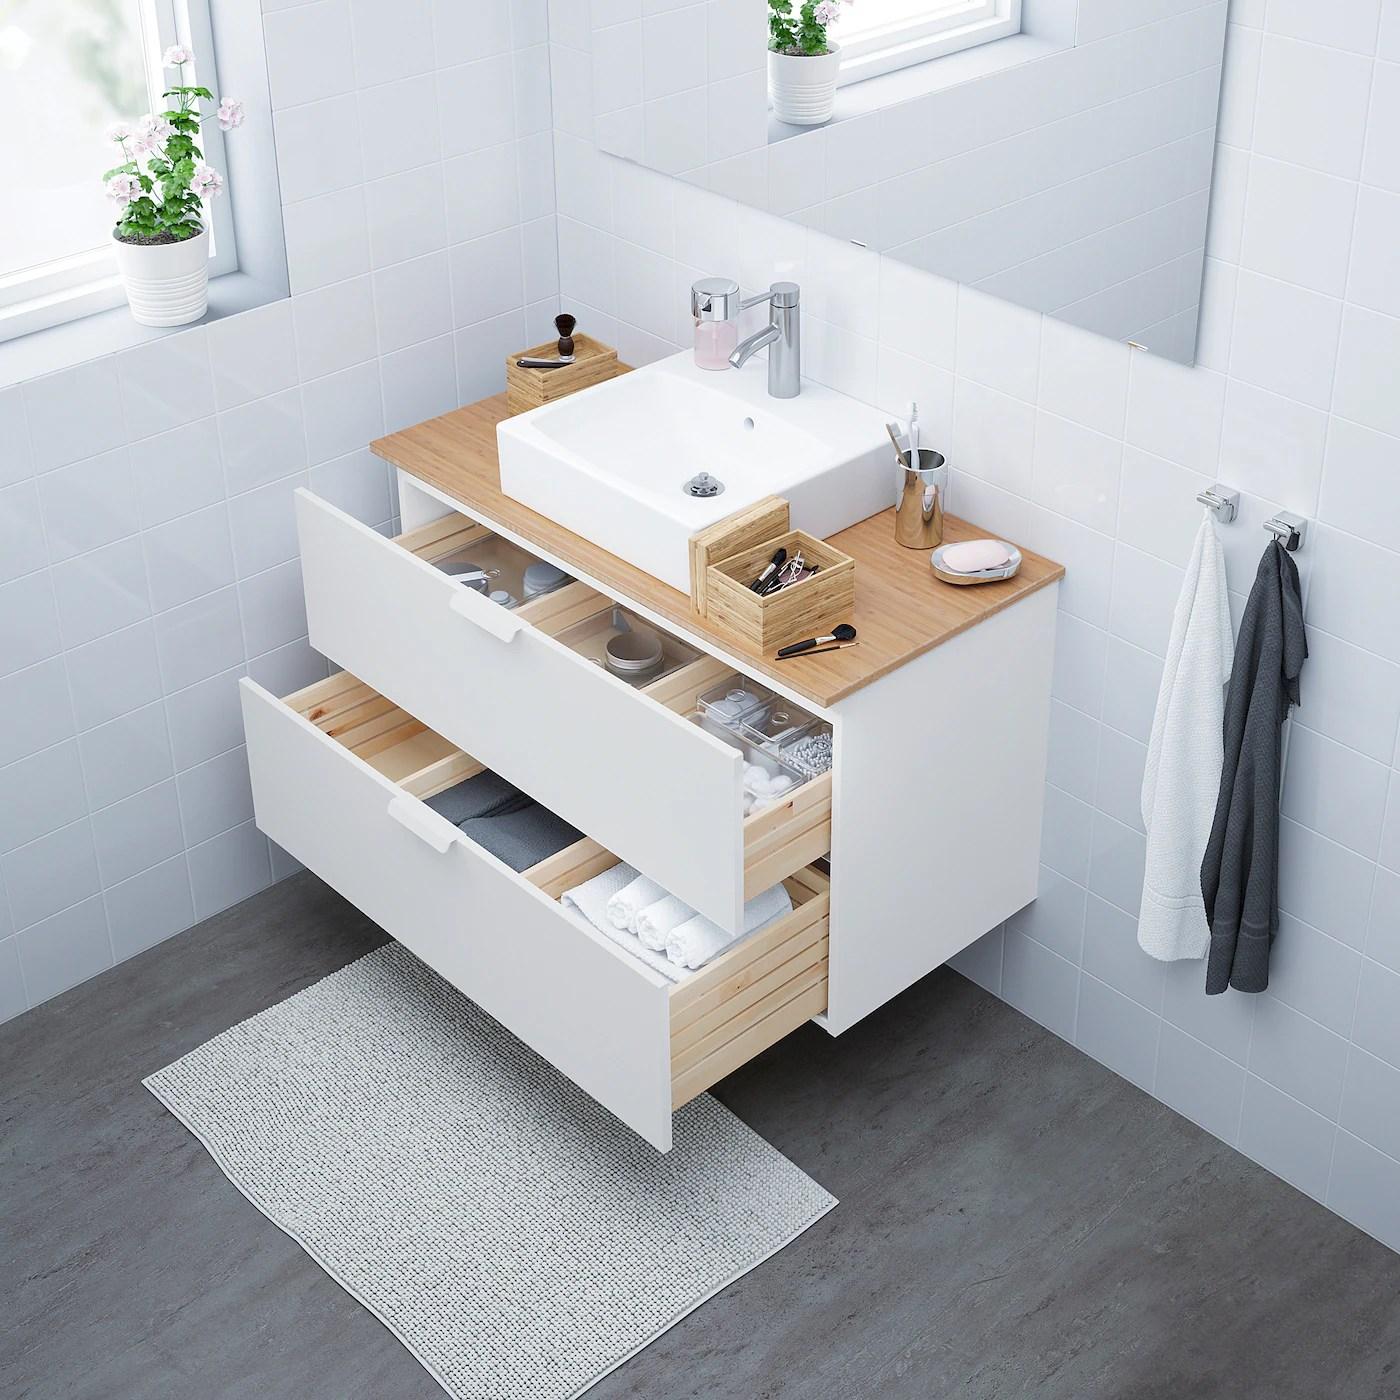 godmorgon tolken tornviken vanity countertop and 17 3 4 sink white bamboo dalskar faucet 40 1 8x19 1 4x28 3 8